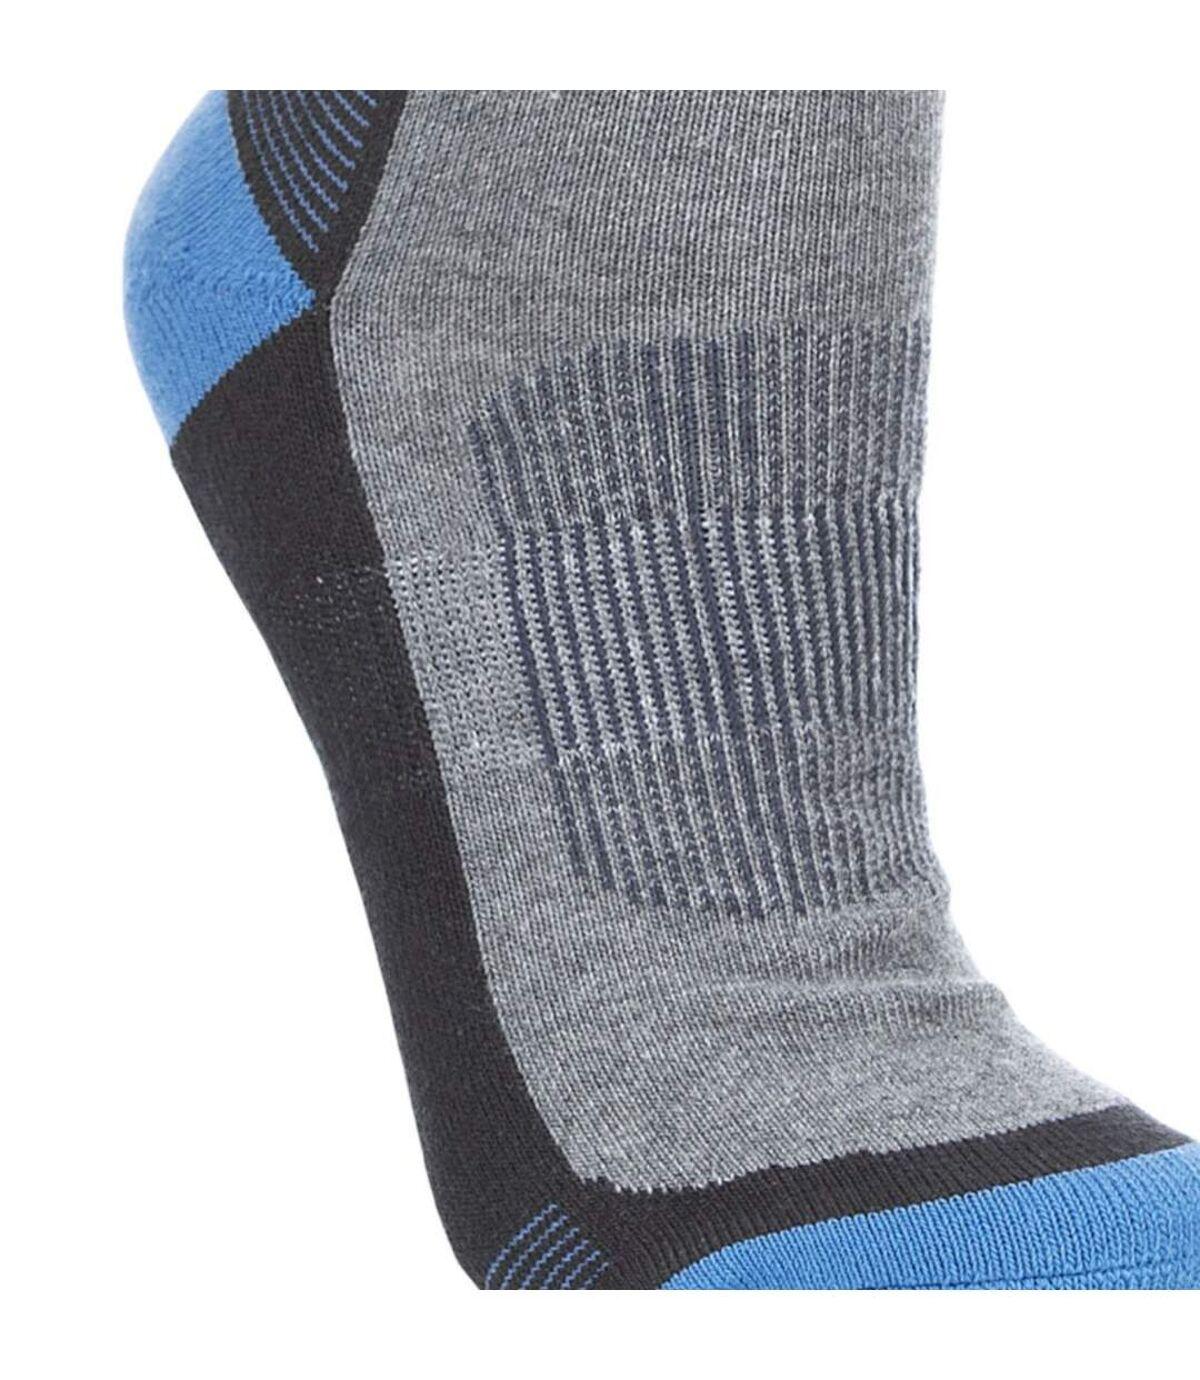 Trespass Mens Deeper Padded Hiking Boot Socks (1 Pair) (Cobalt) - UTTP324